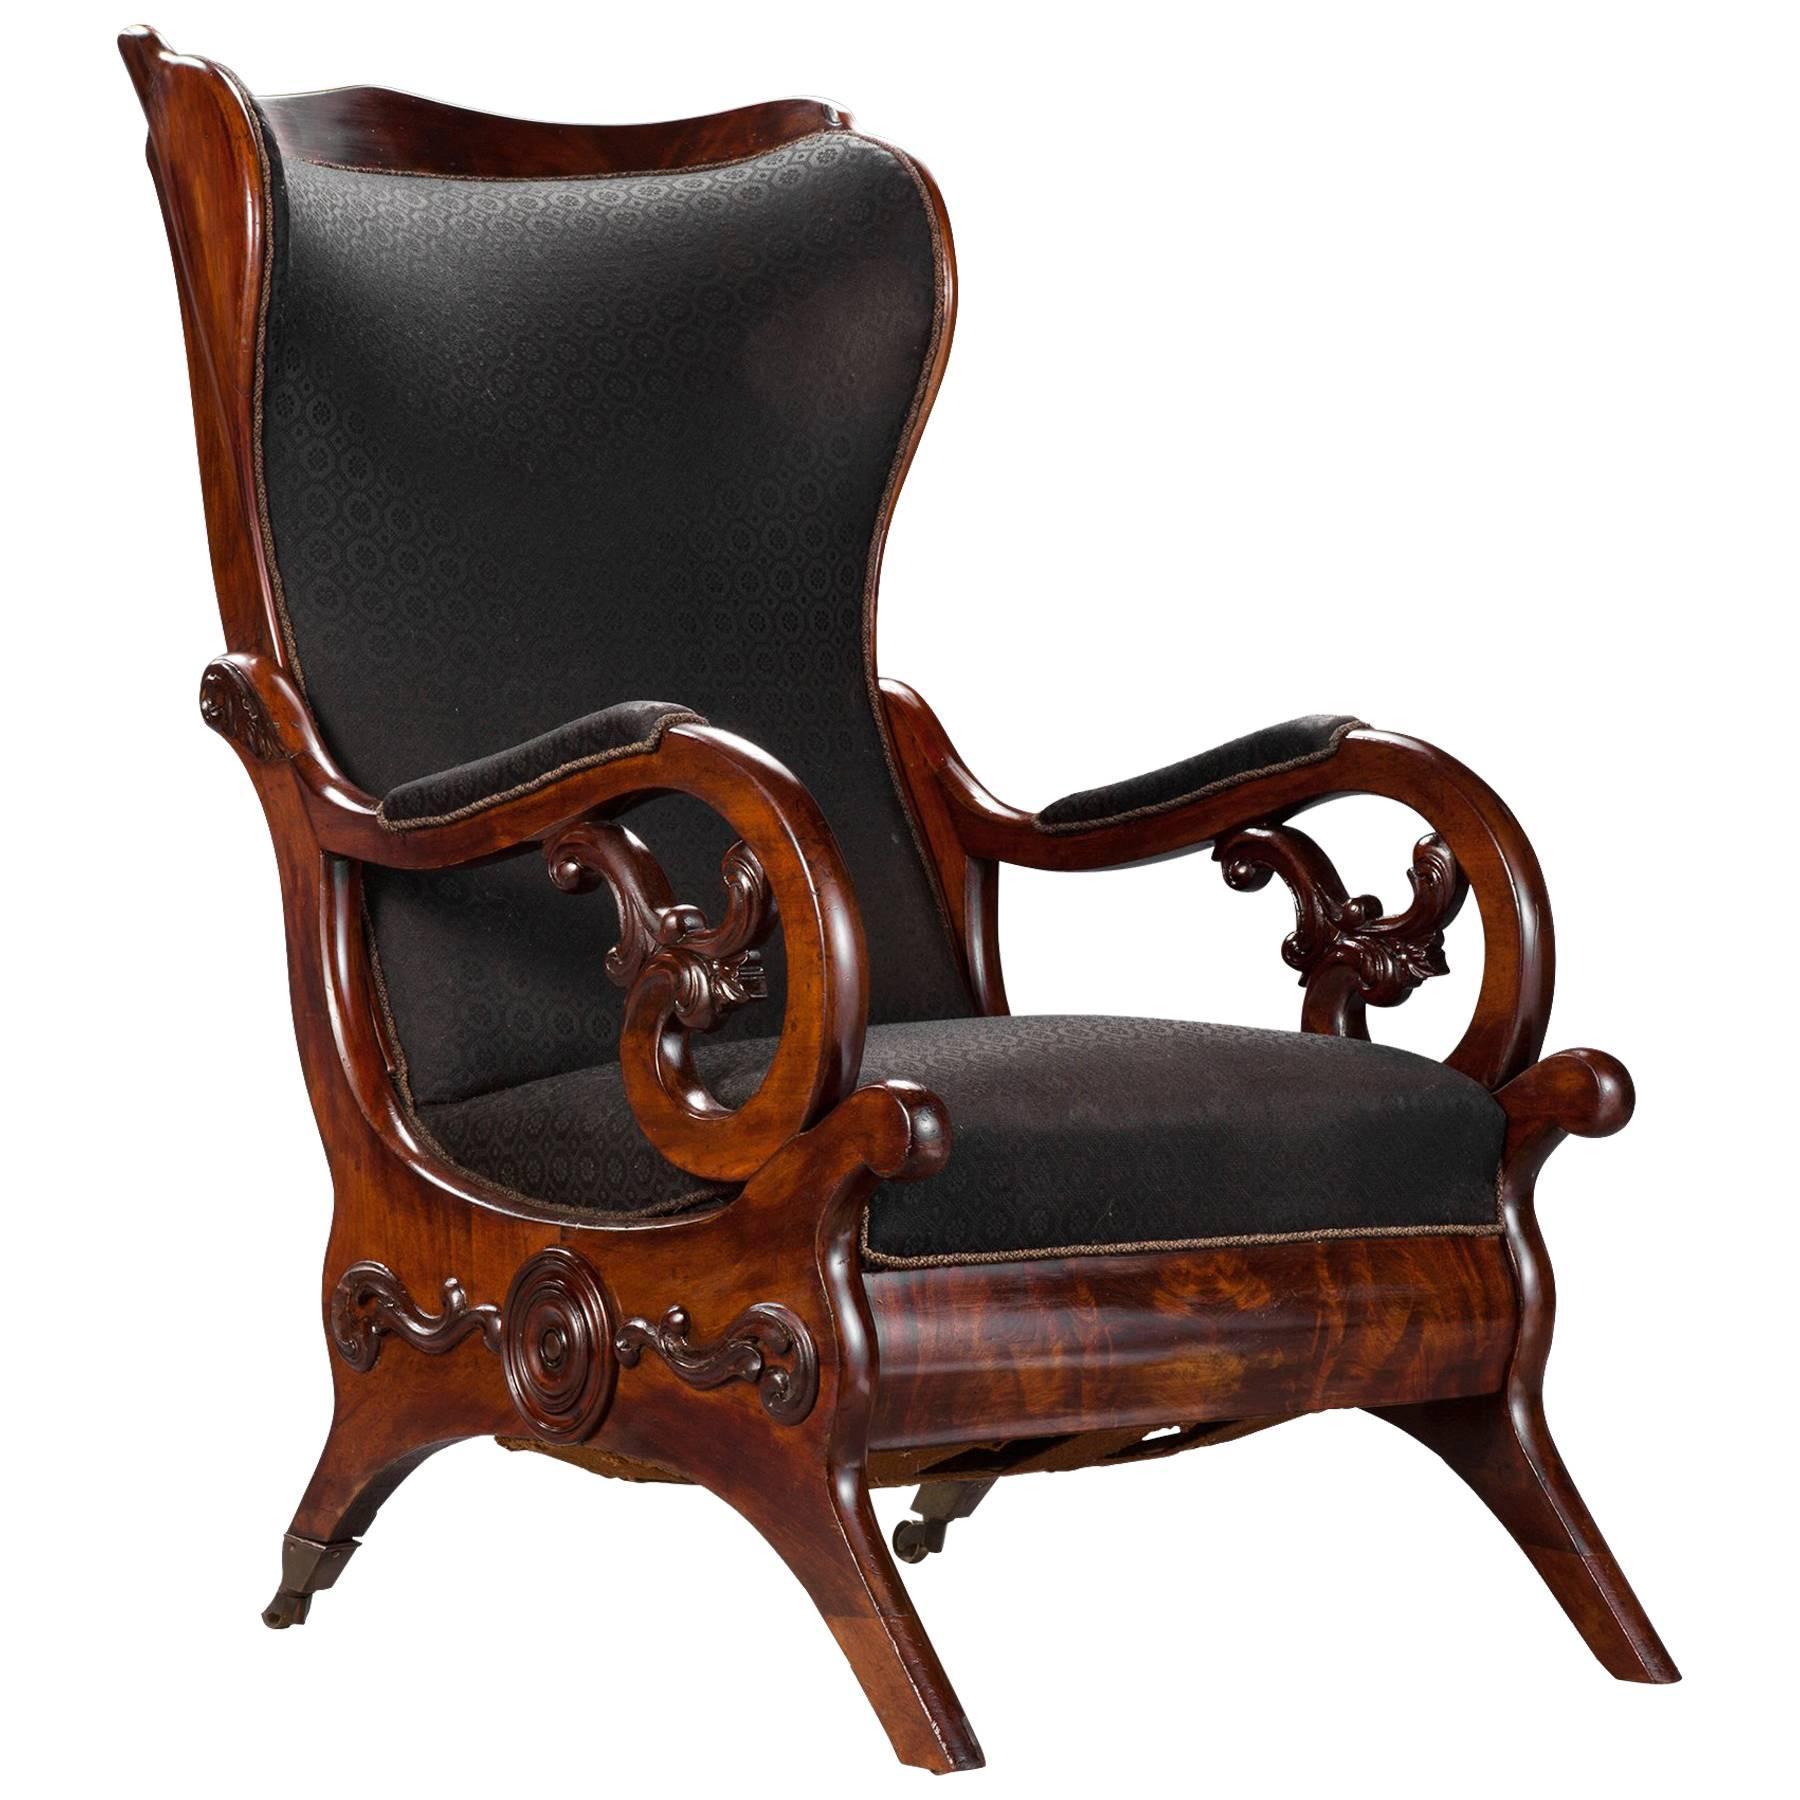 Carved Mahogany Wingback Library Chair, Circa 1840